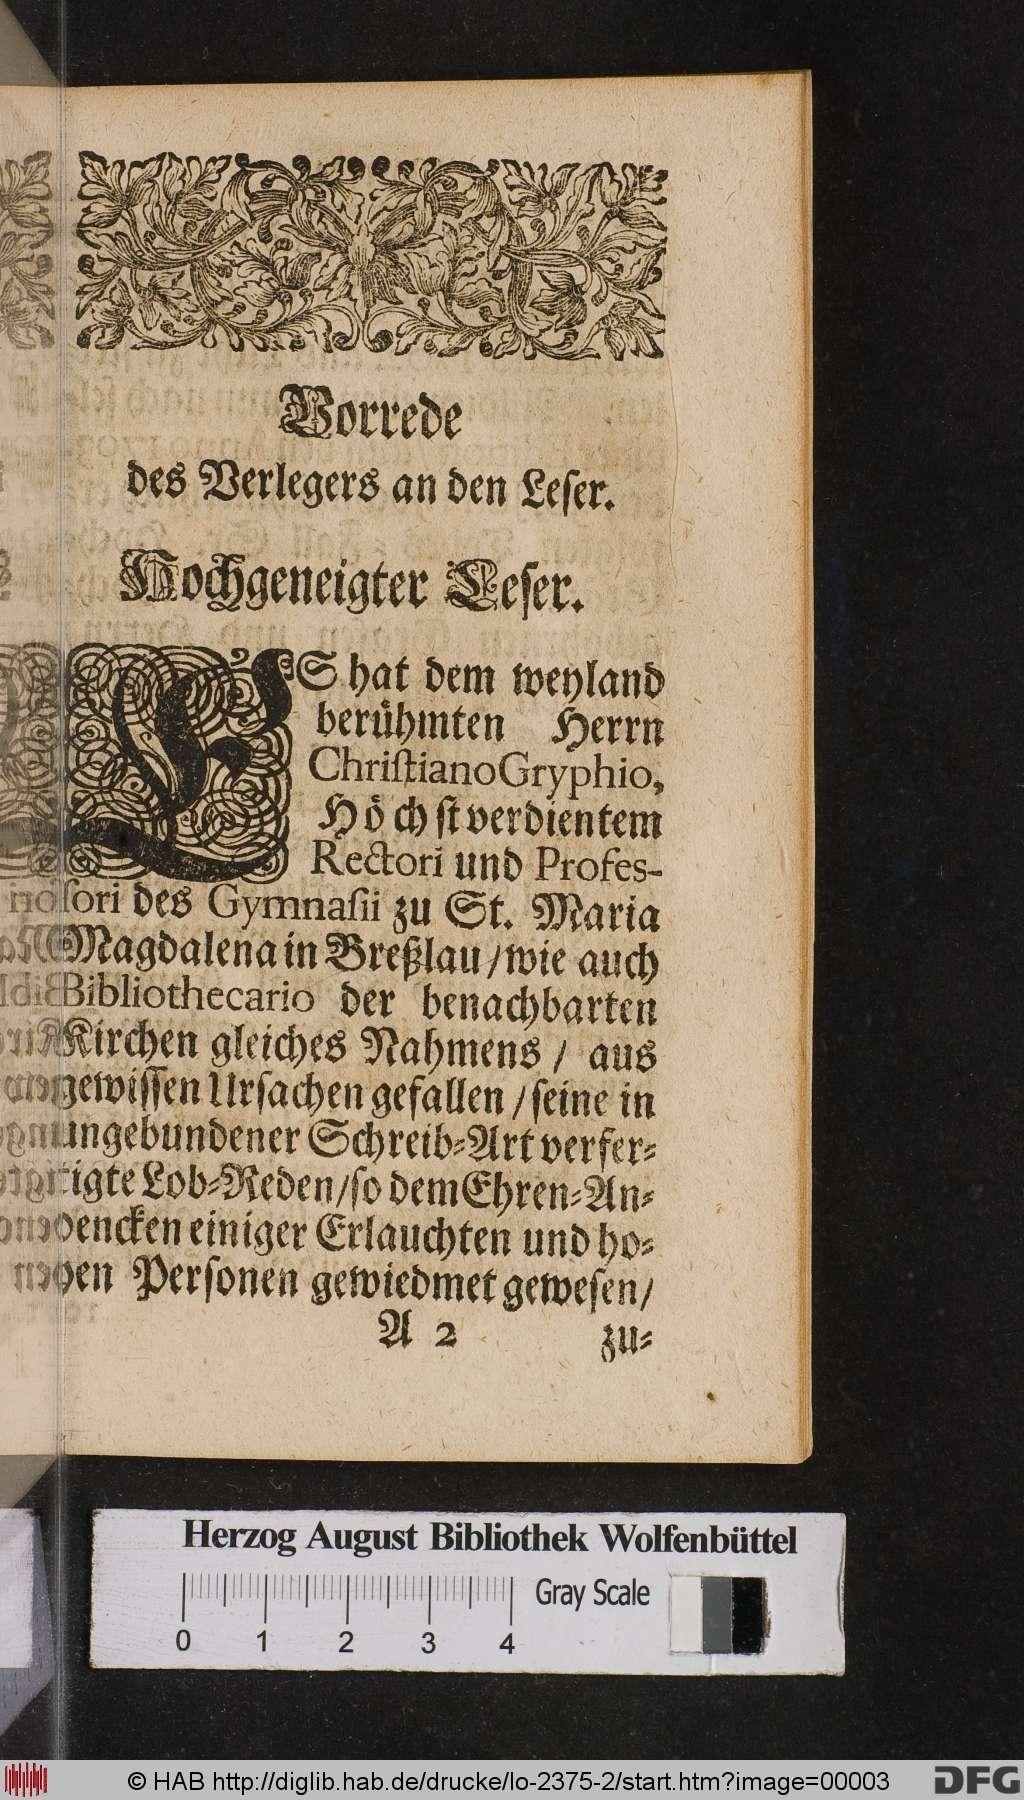 http://diglib.hab.de/drucke/lo-2375-2/00003.jpg